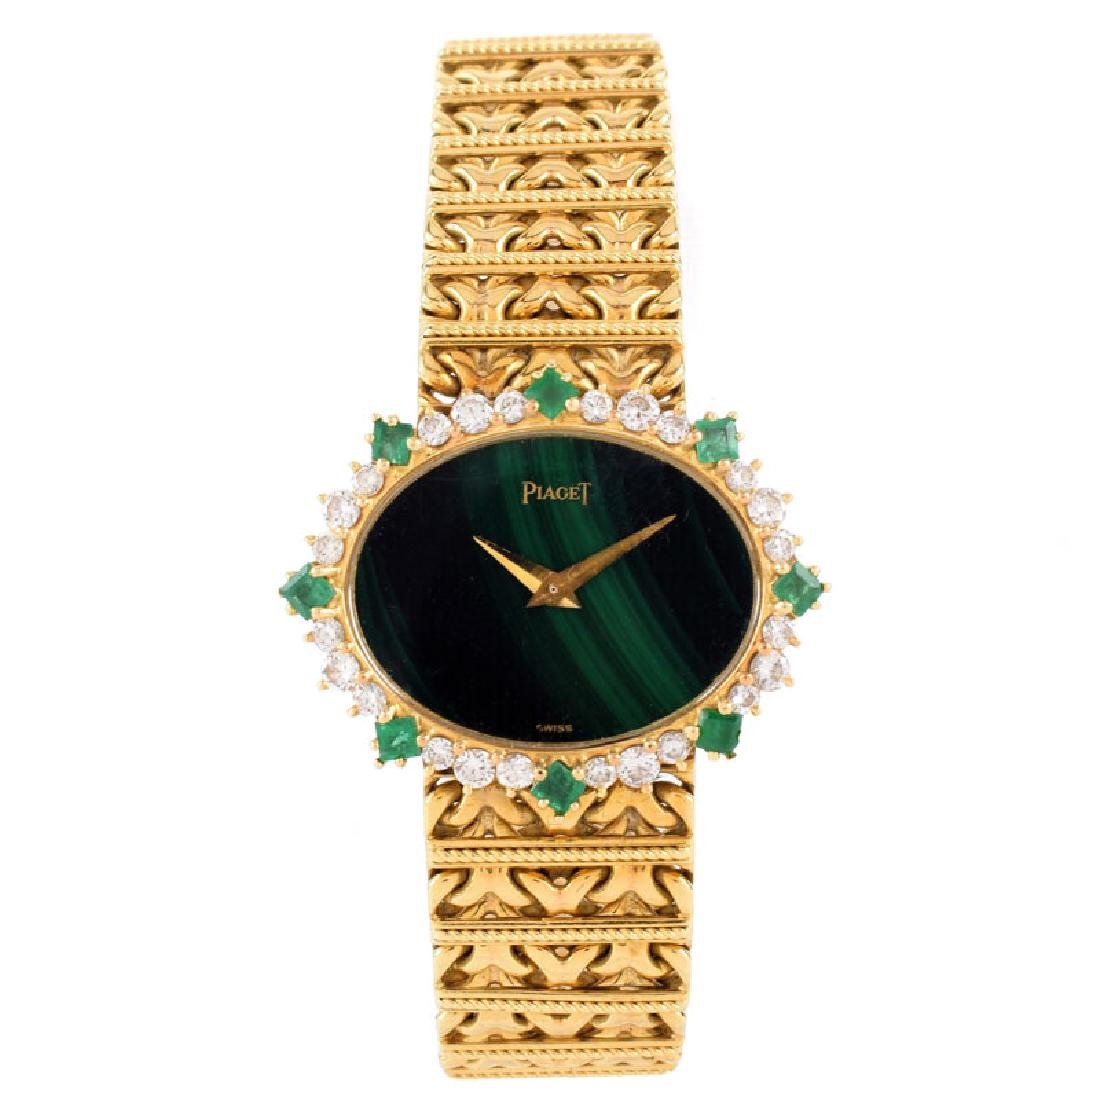 Lady's Vintage Piaget 18 Karat Yellow Gold, Diamond and - 2